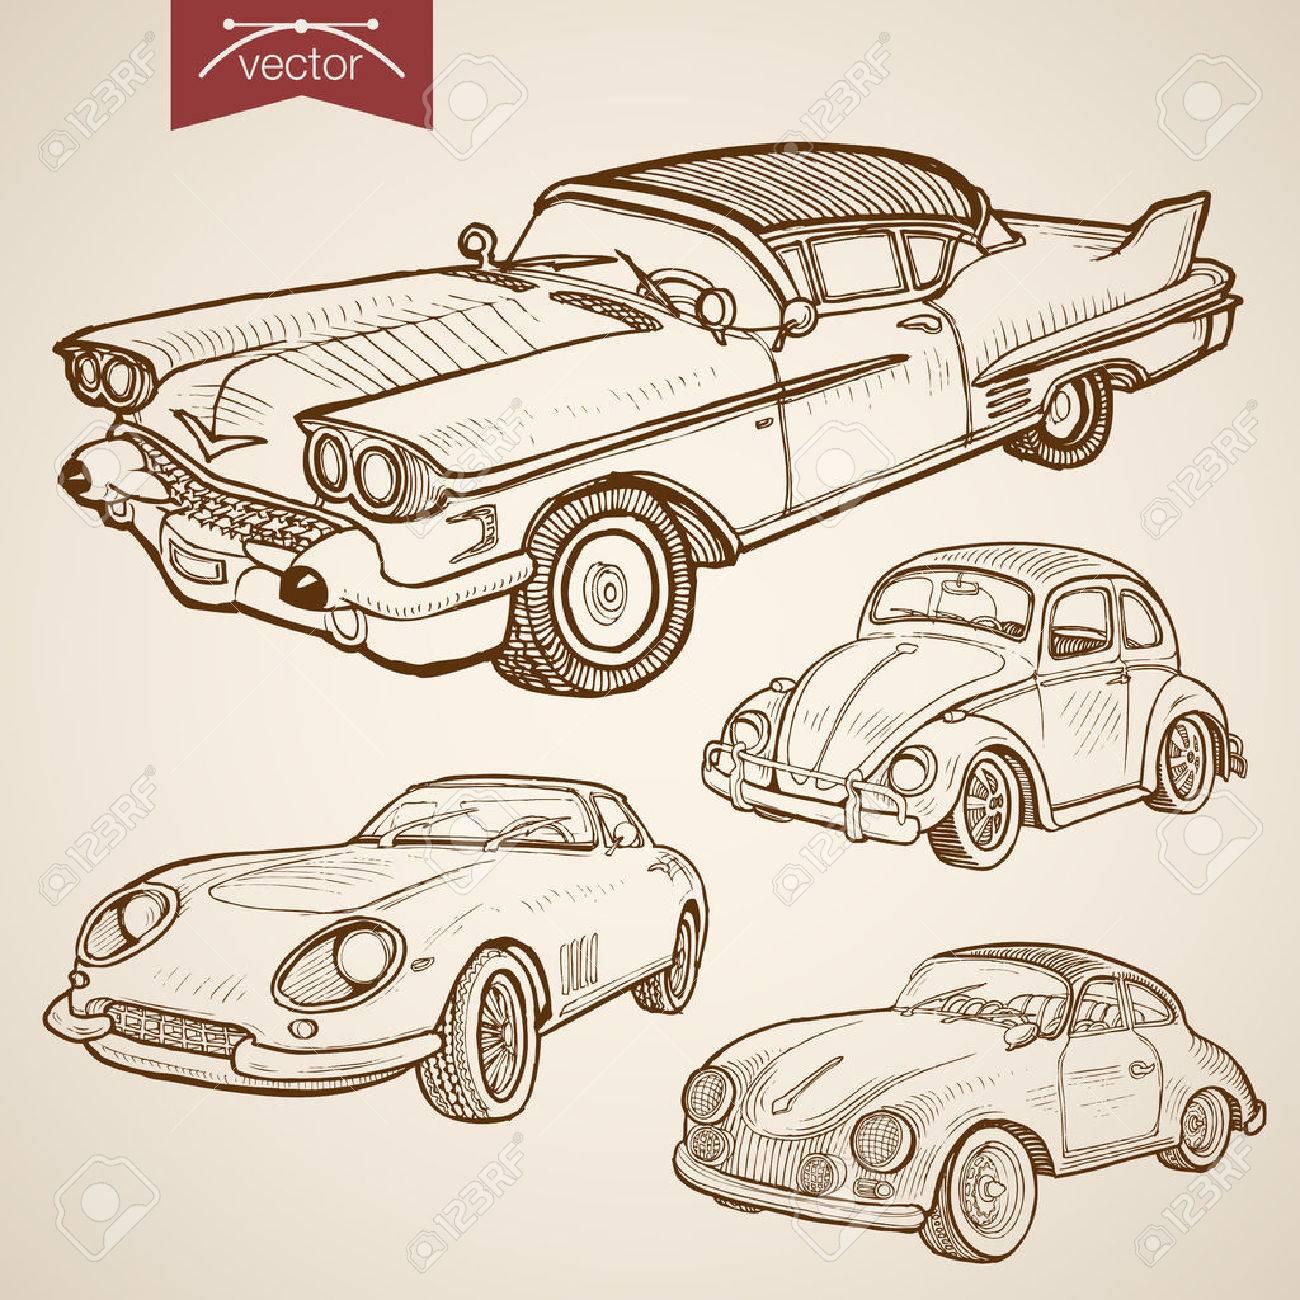 Engraving vintage hand drawn vector retro car collection. Pencil Sketch wheeled transport illustration. - 60587690